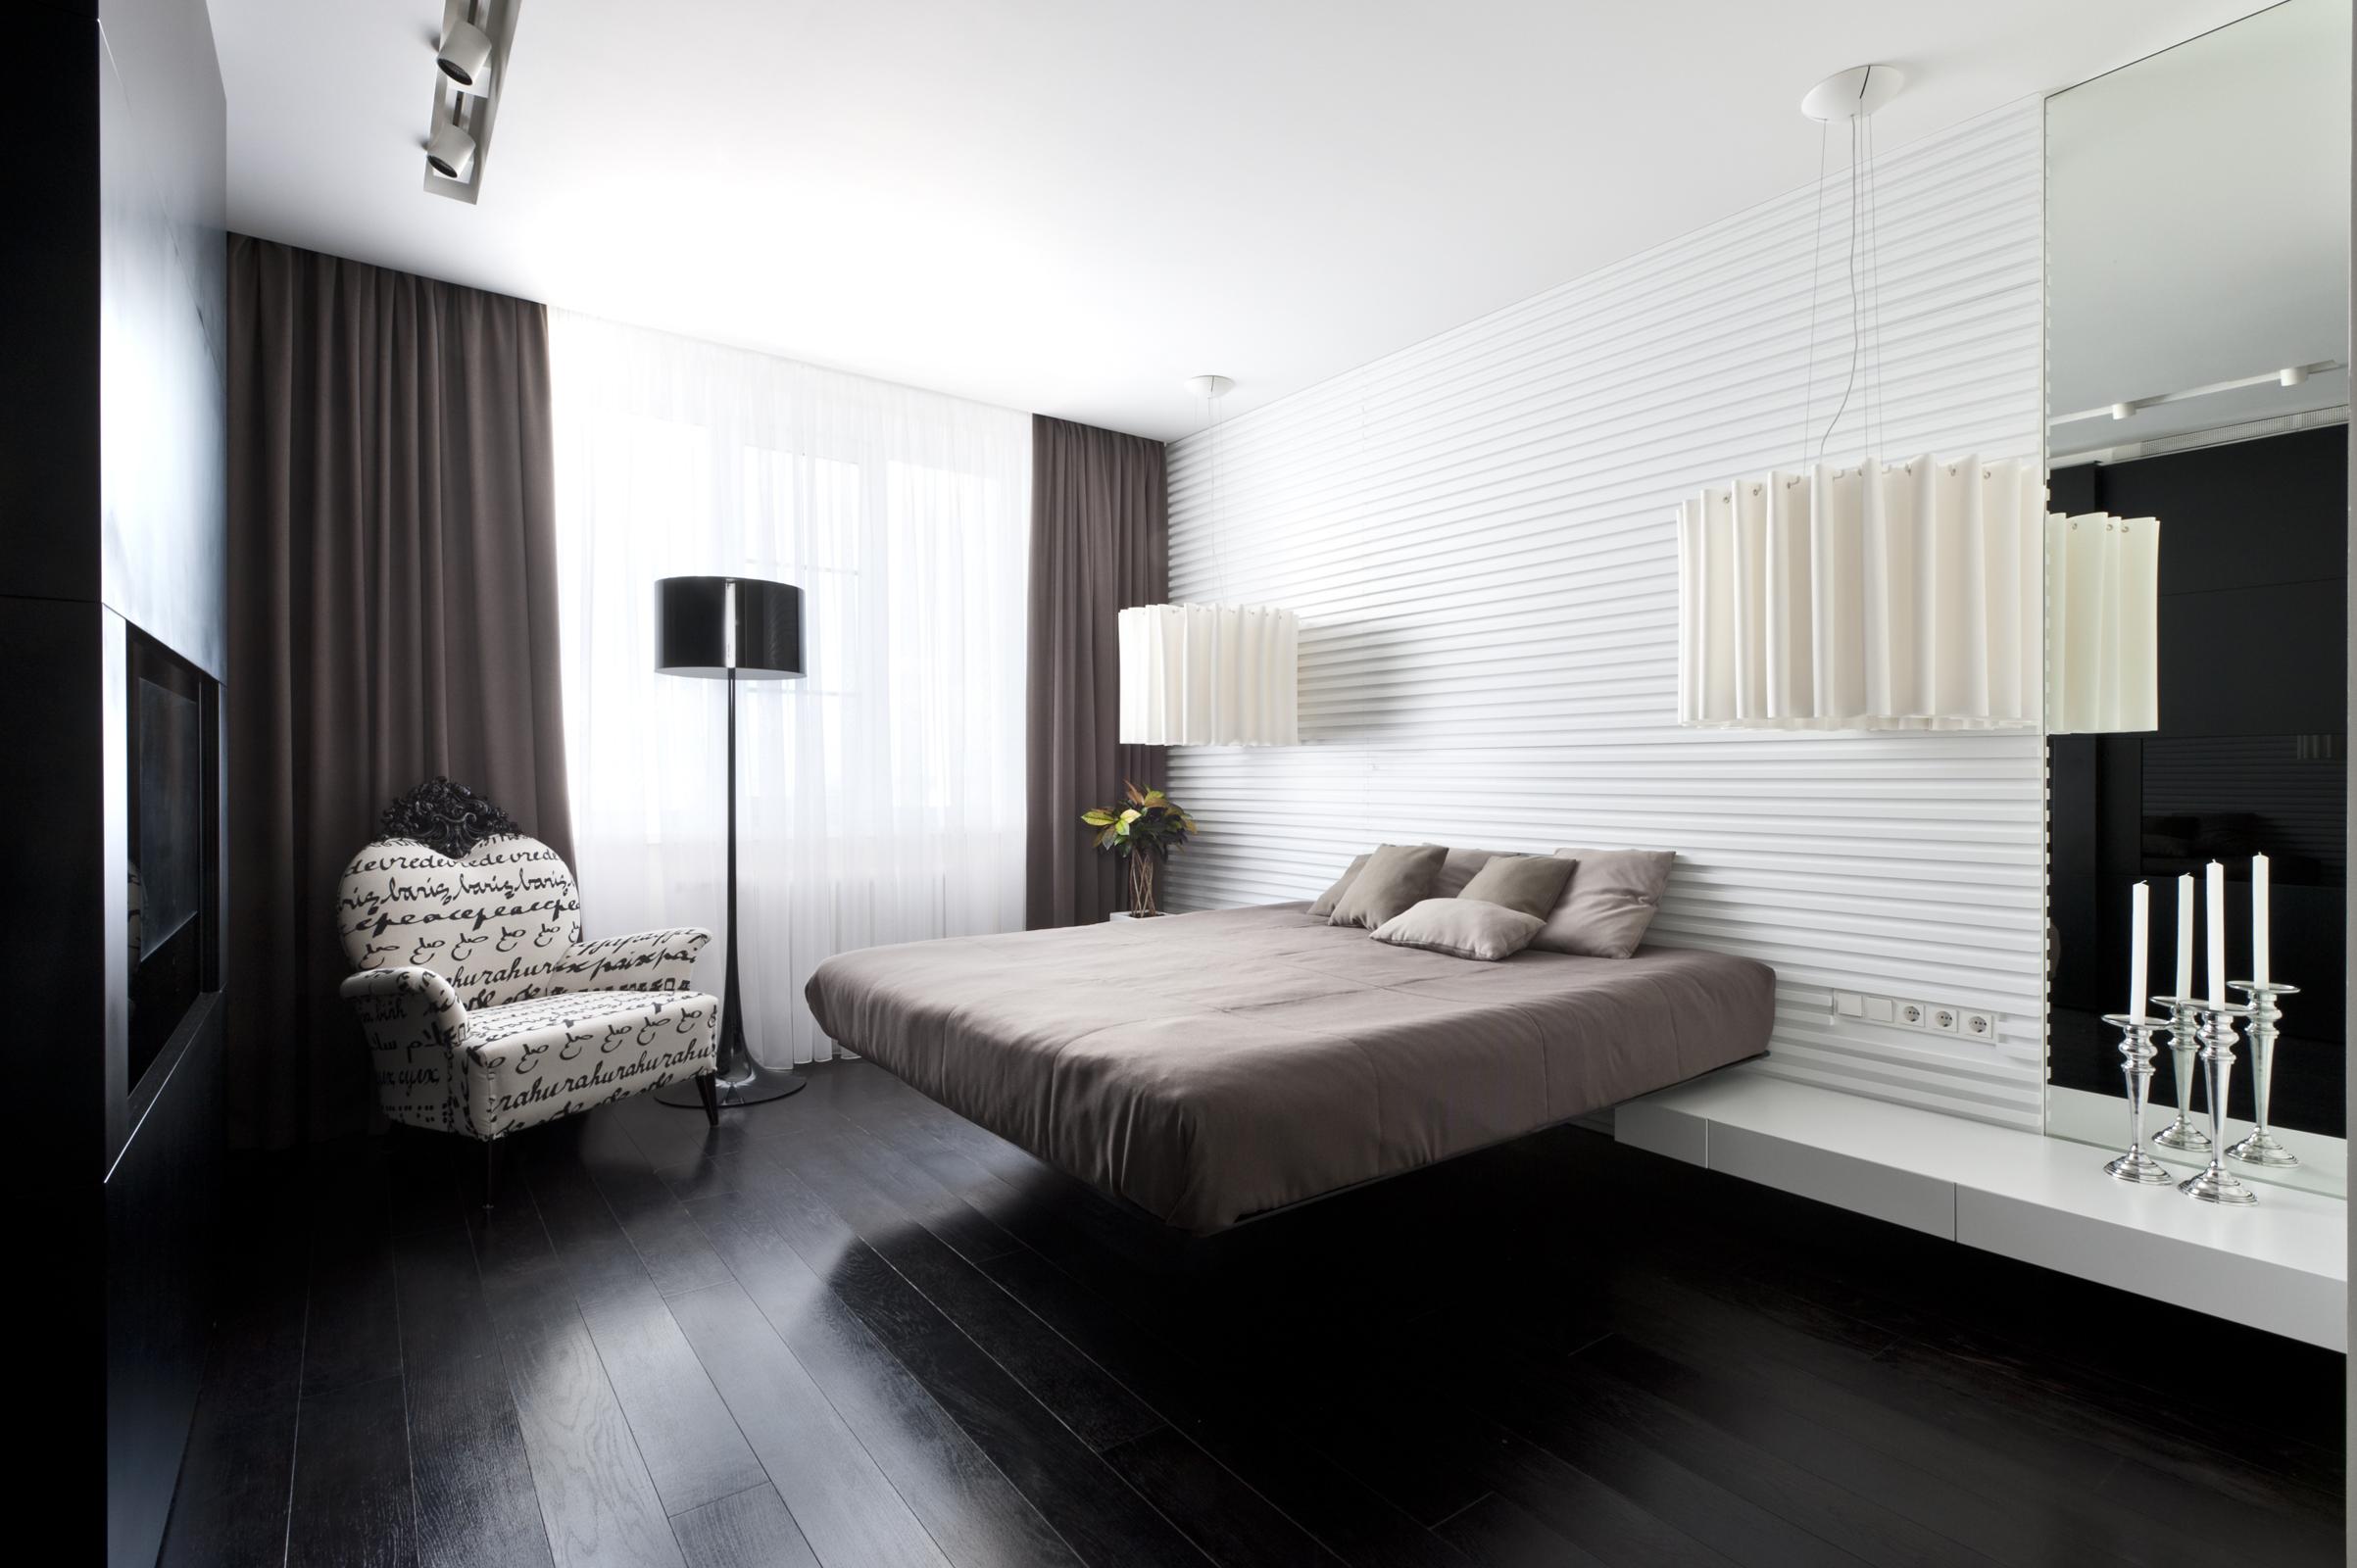 View In Gallery Hiasan Dalaman Bilik Tidur Moden Gelap Dan Terang Dengan Lampu Lantai Menarik